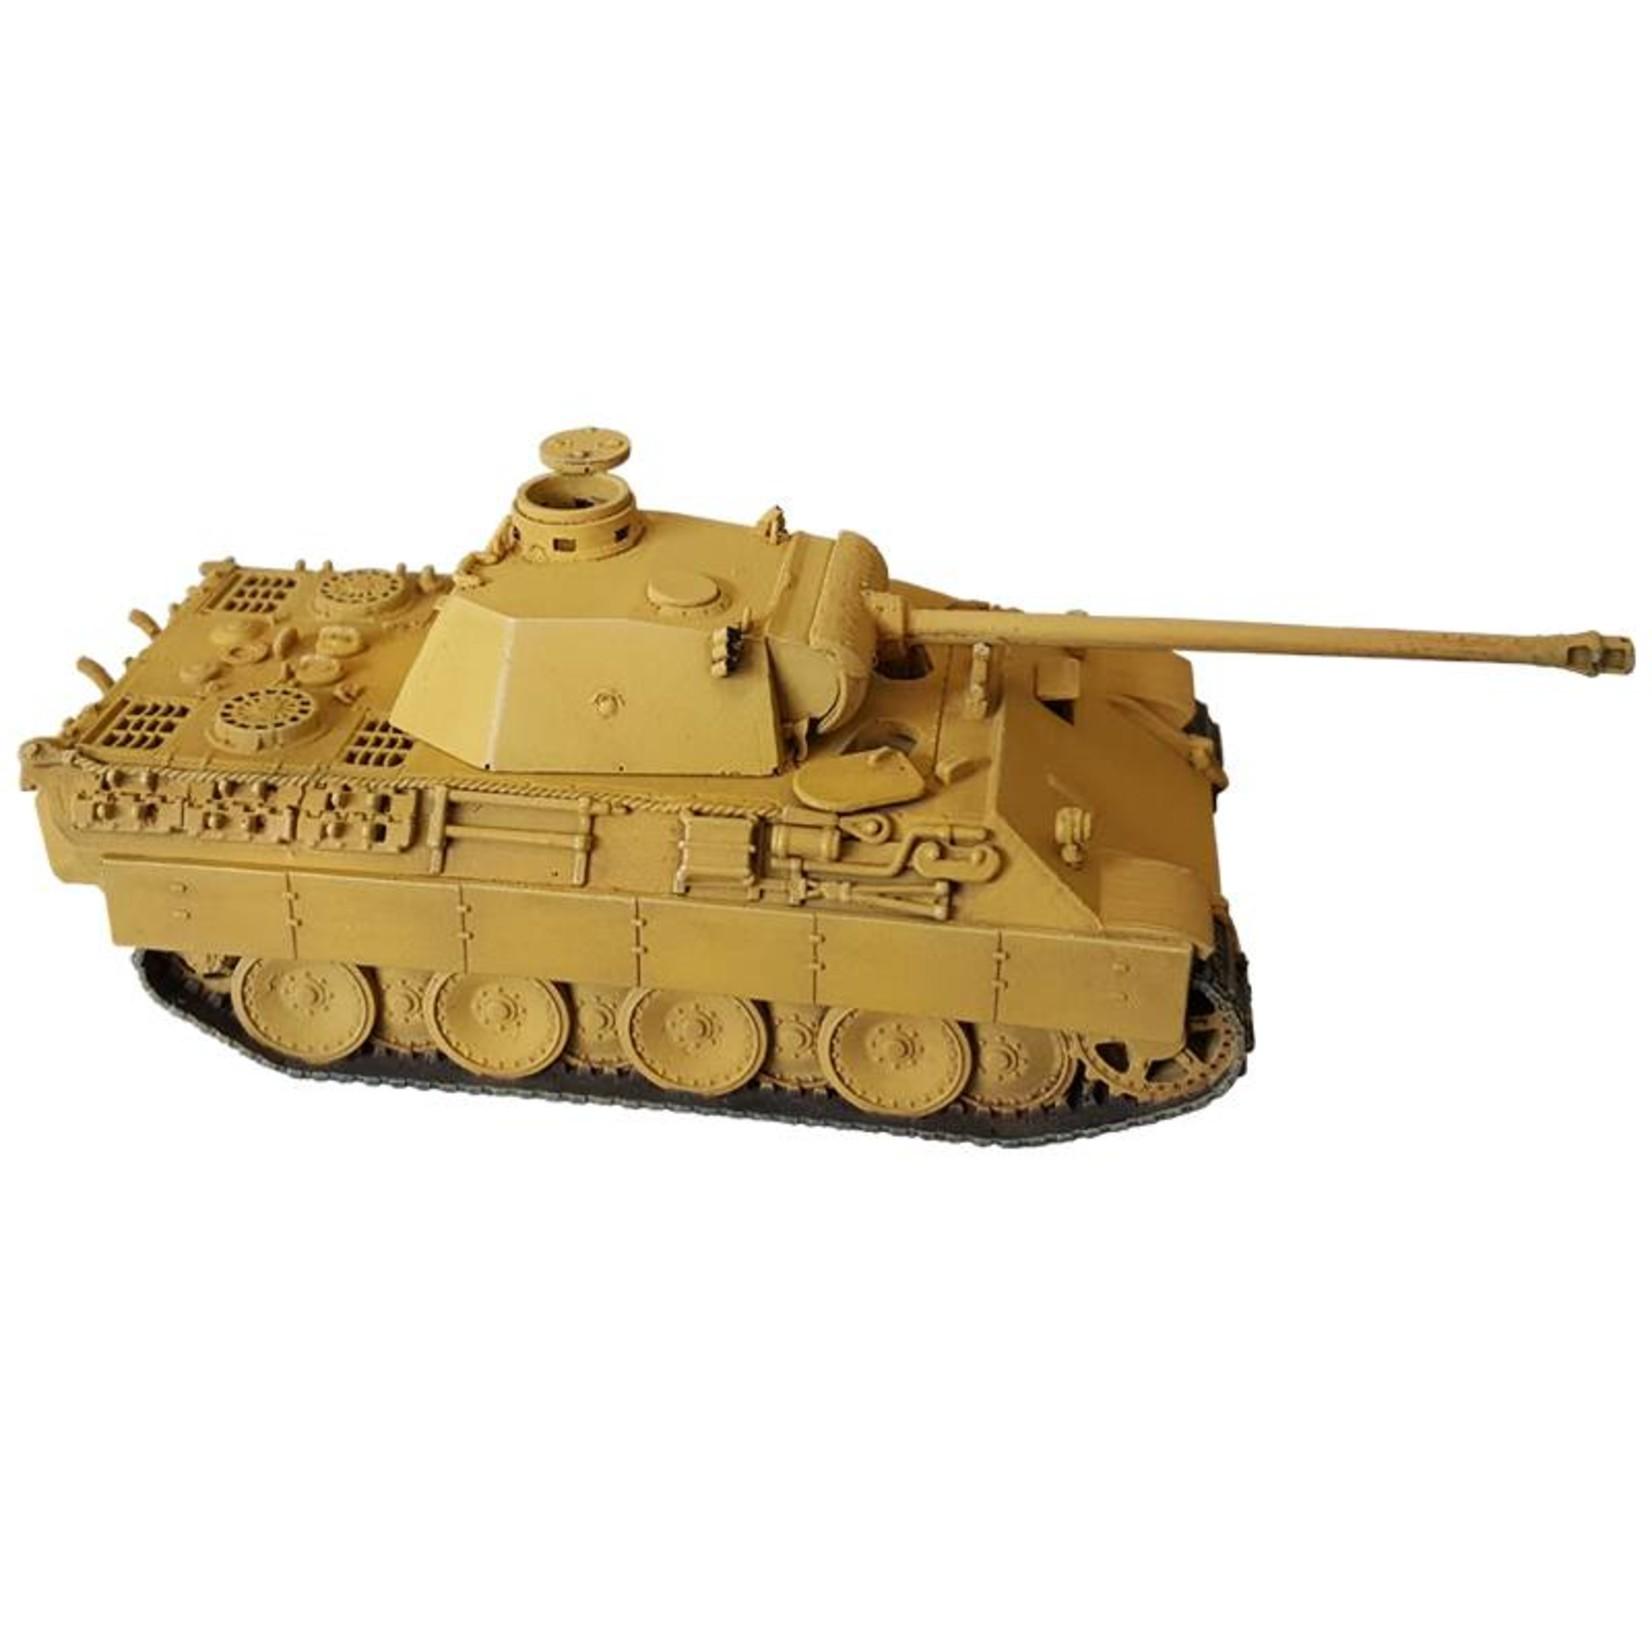 Pz. Kpfw. V panther Ausf. D